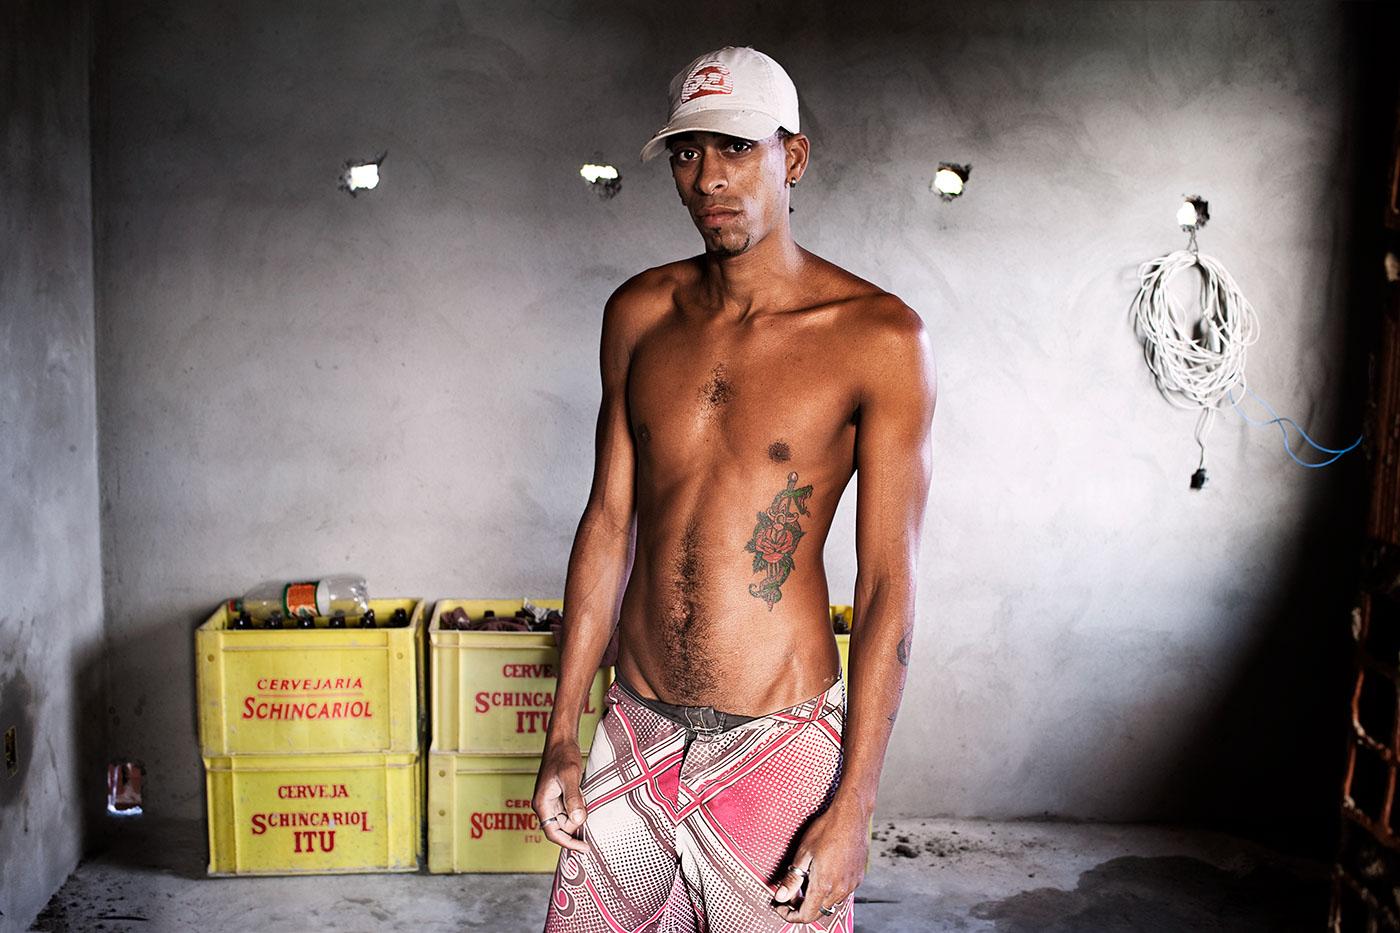 Brazil itaparica bahia tourism Documentary  beach social documentary Employment